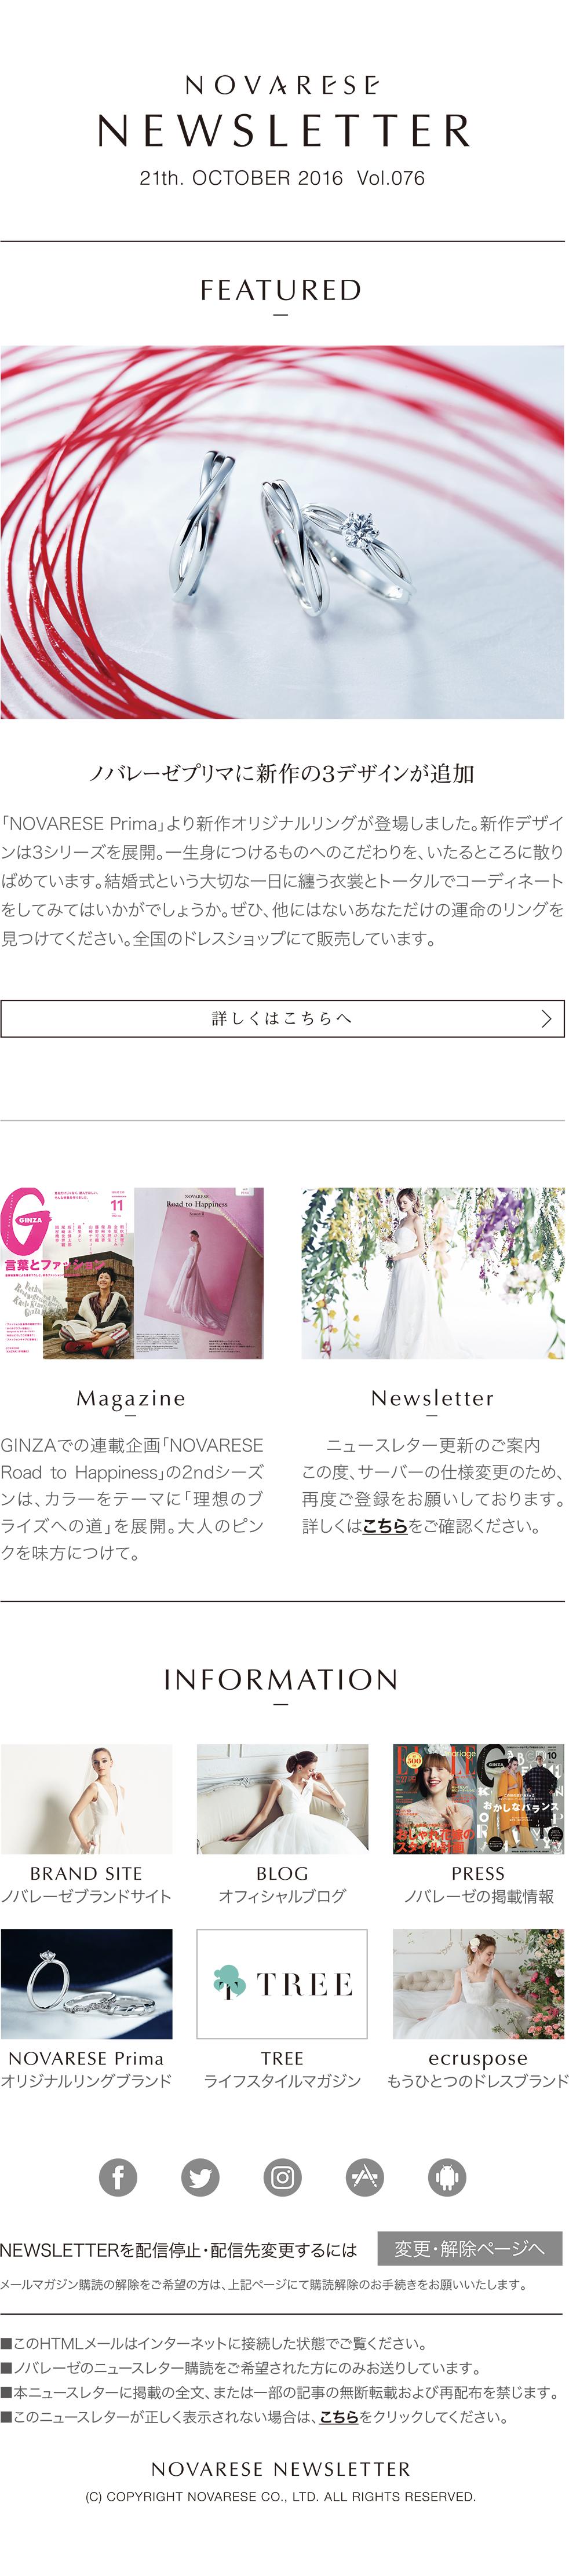 NOVARESE NEWSLETTER Vol.075